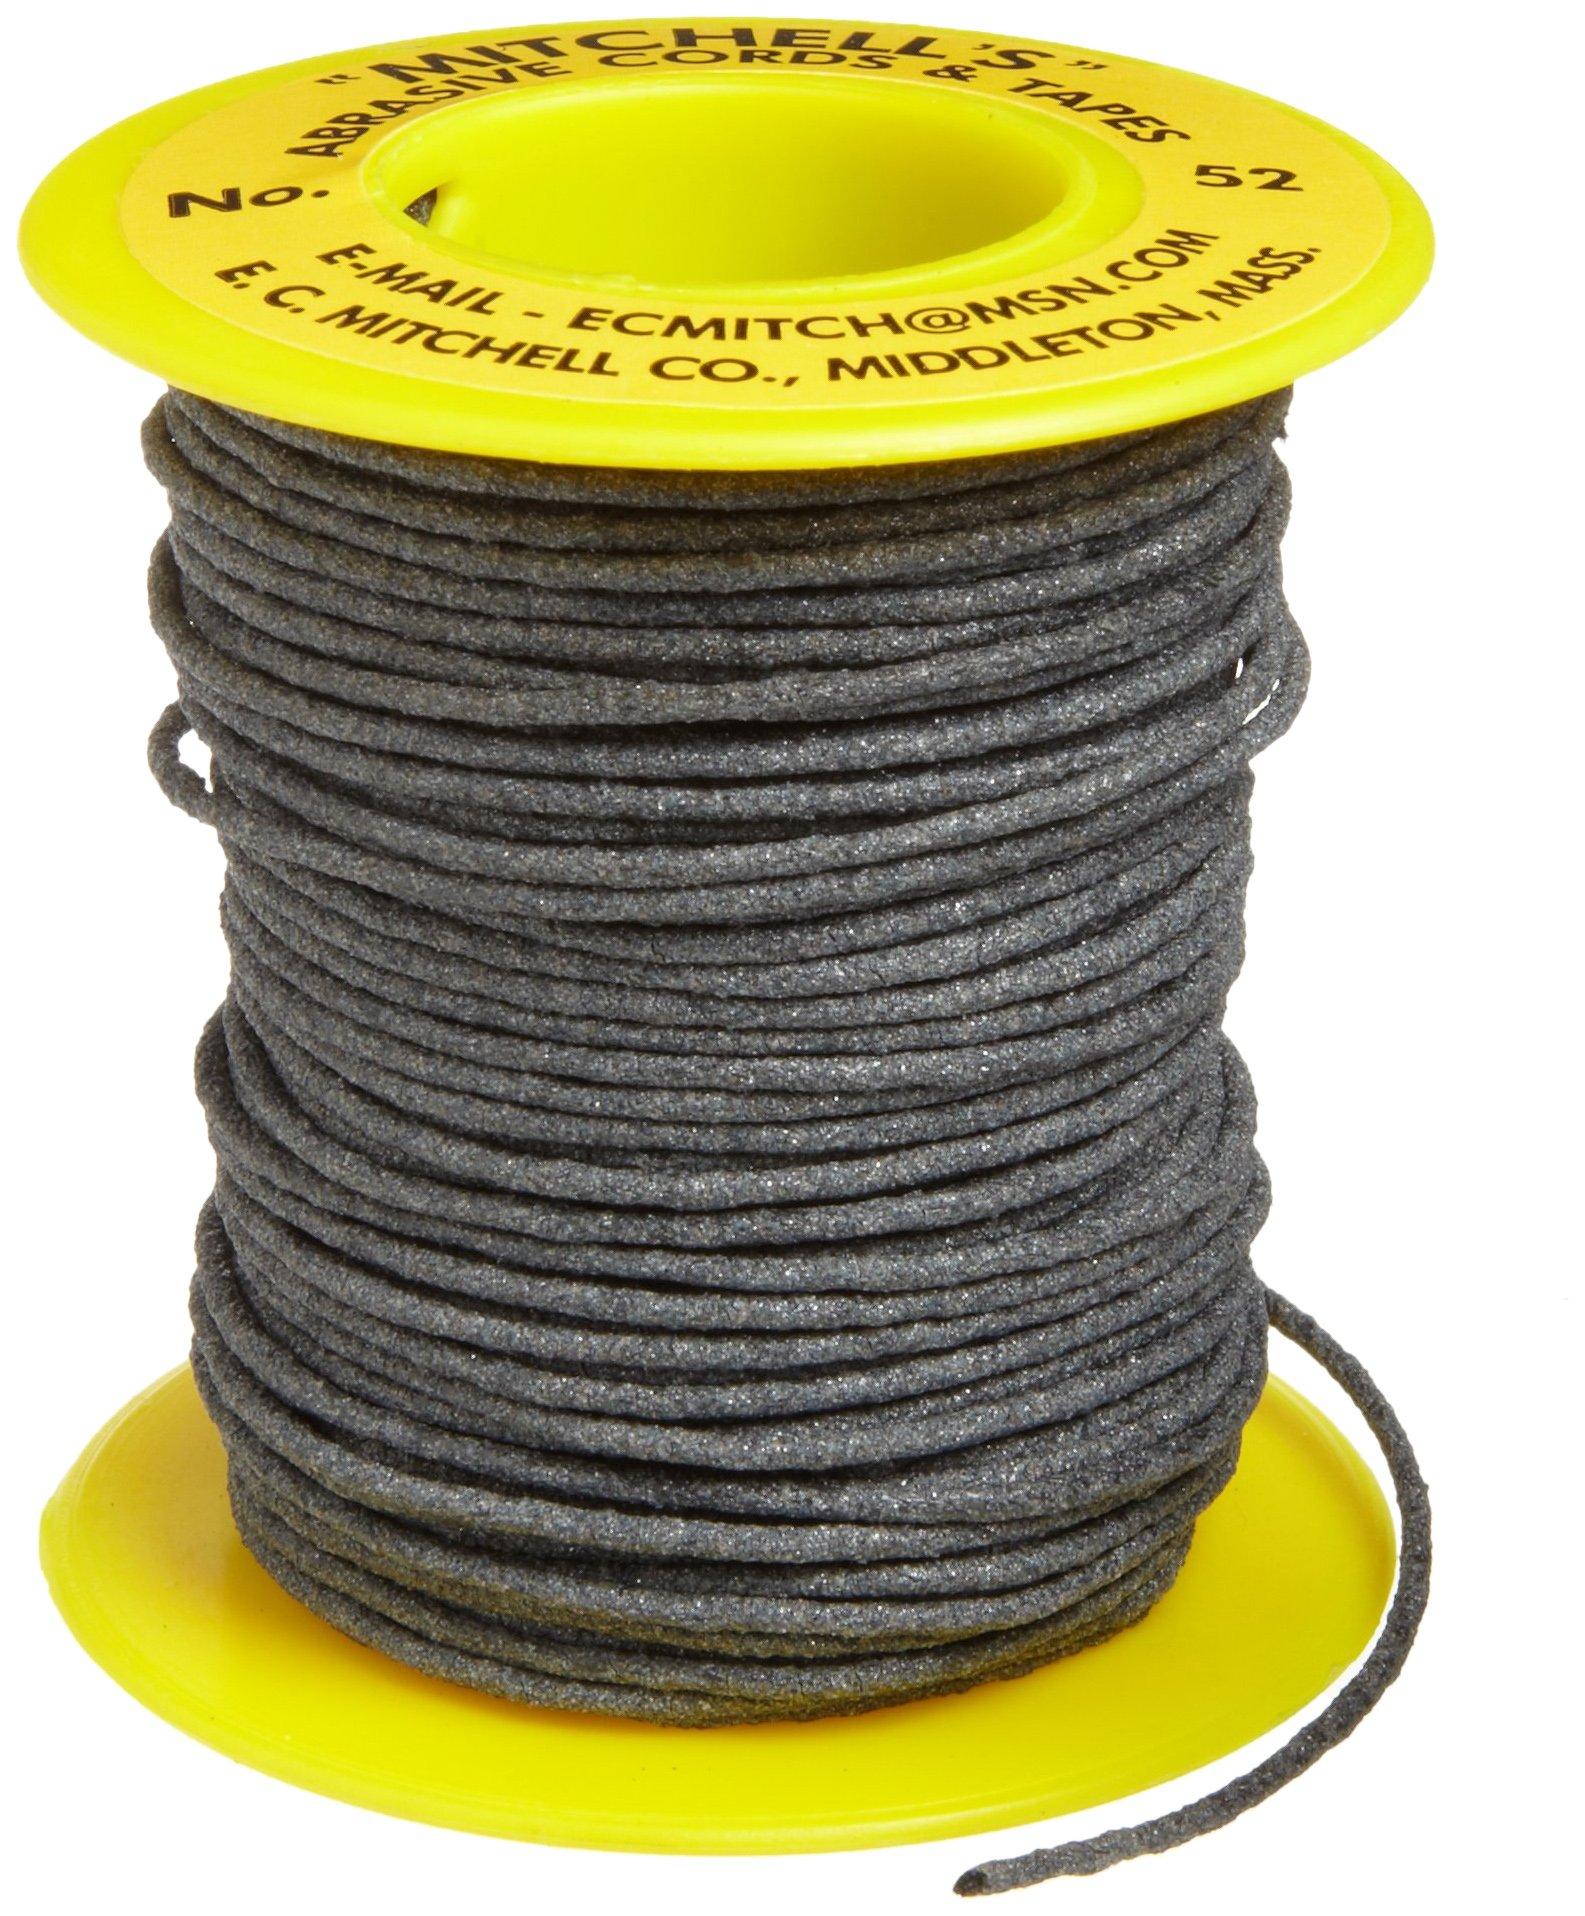 Mitchell Abrasives 52 Round Abrasive Cord, Aluminum Oxide 150 Grit .055'' Diameter x 25 Feet by Mitchell Abrasives